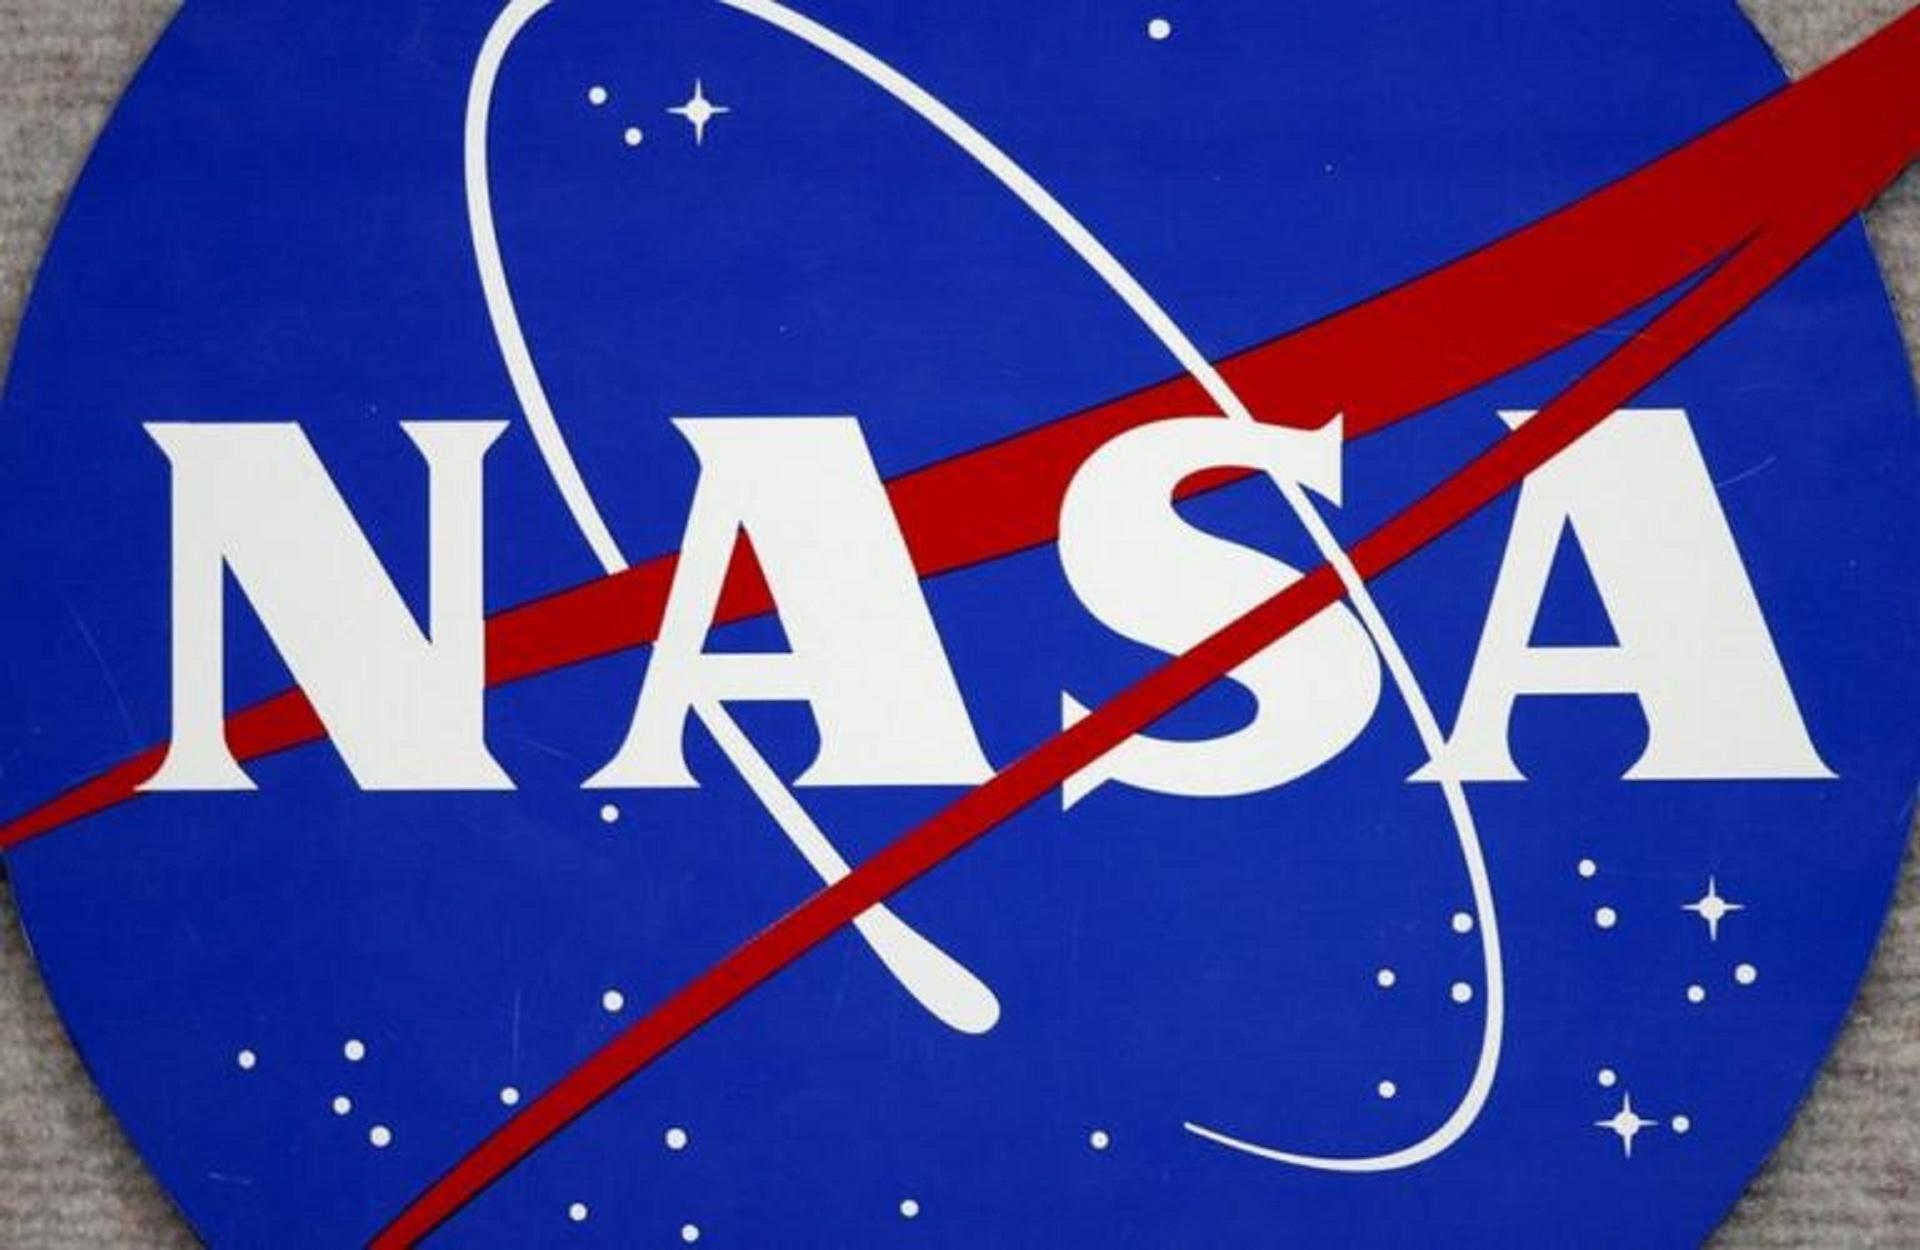 NASA: Άλμπουμ με τεχνουργήματα που χρησιμοποιήθηκαν τα 50 τελευταία χρόνια!